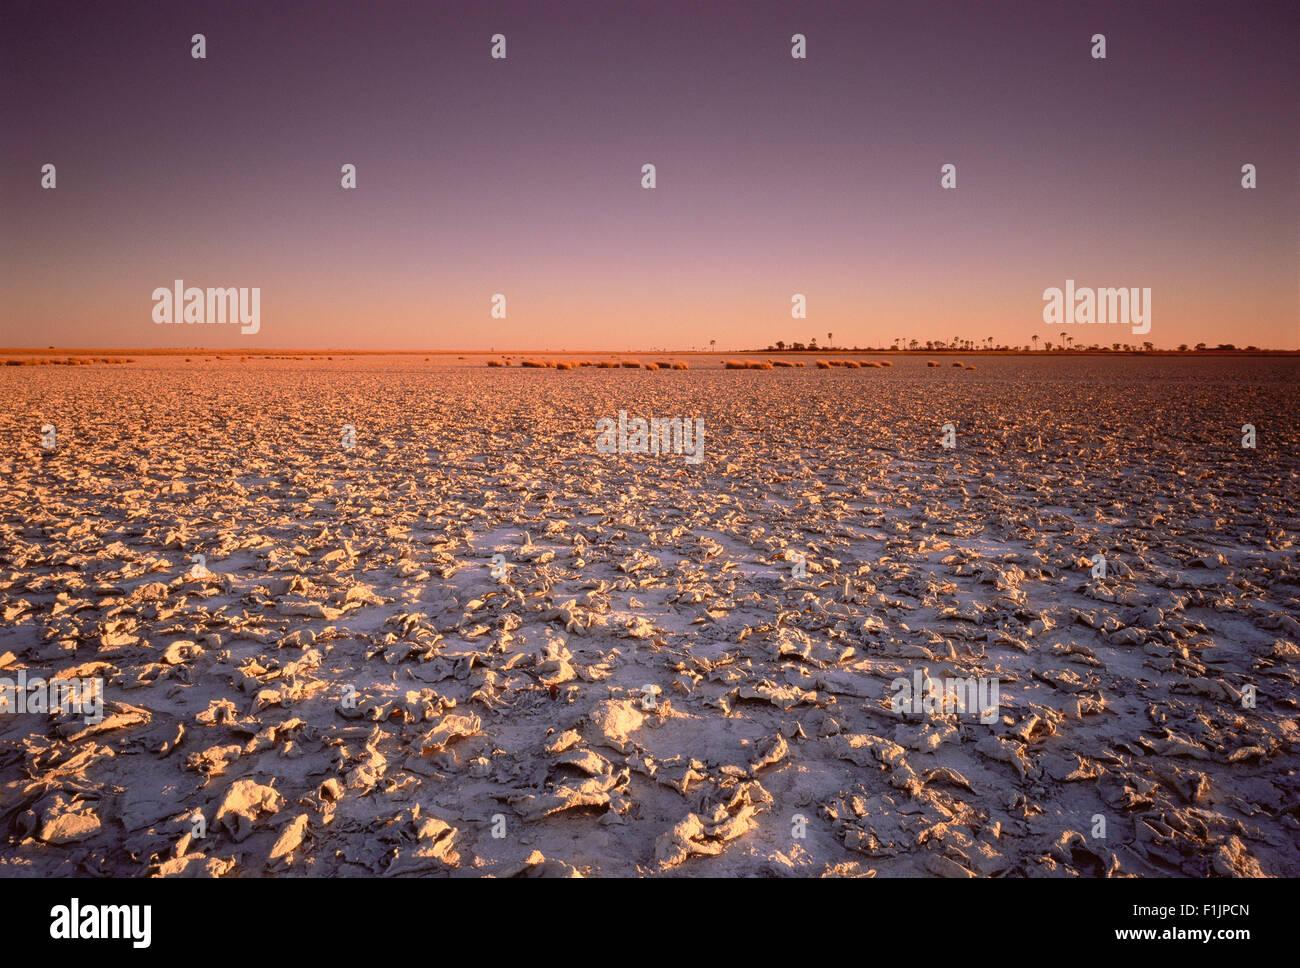 Sunset over Makgadikgadi Pans Botswana, Africa, South Africa - Stock Image